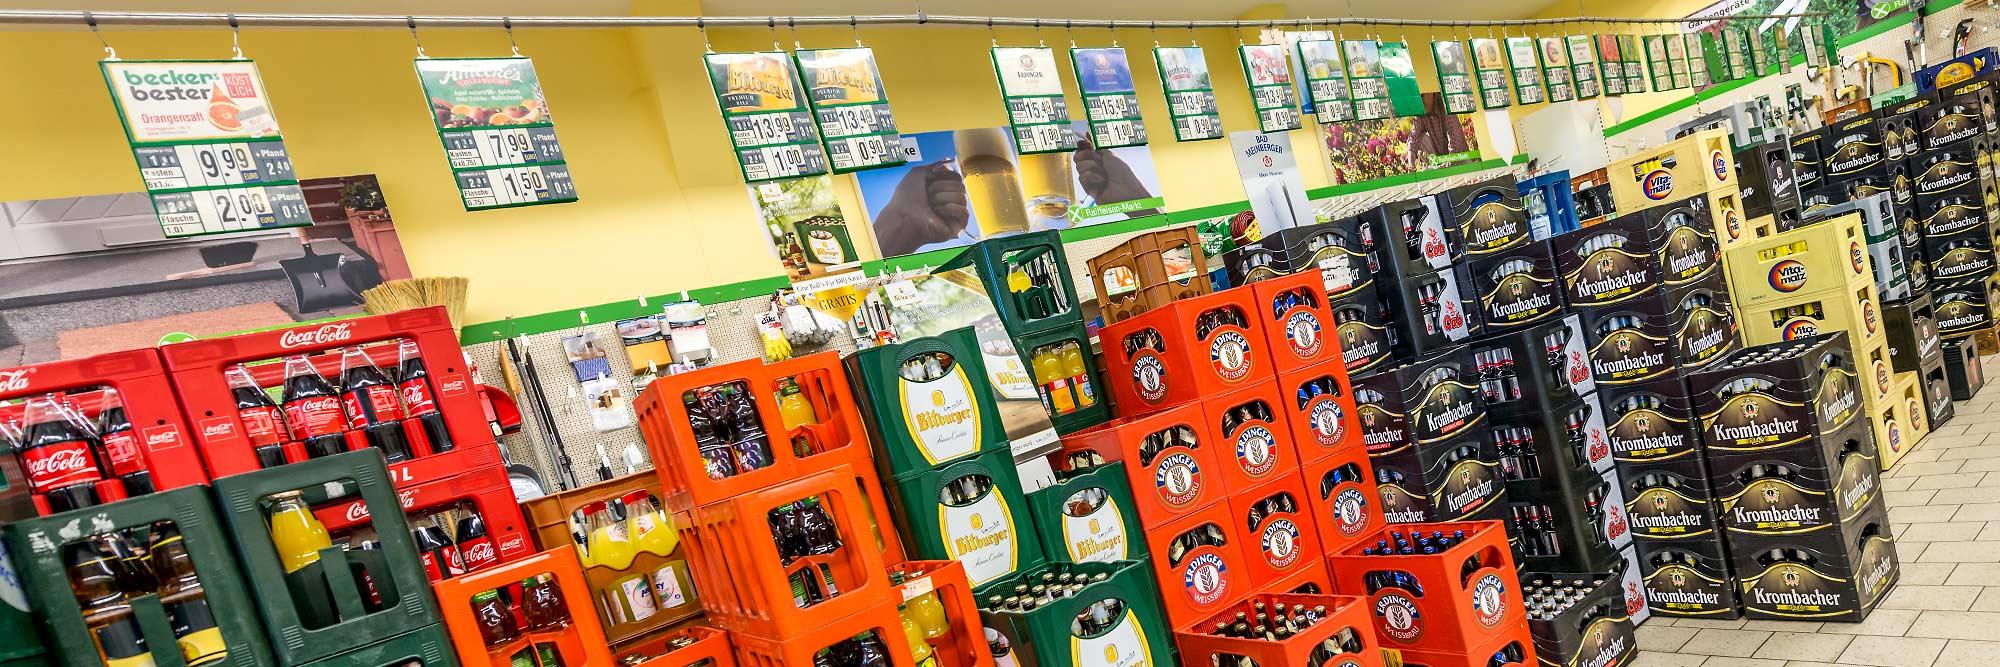 Raiffeisen Markt Ottmarsbocholt Getränke 2